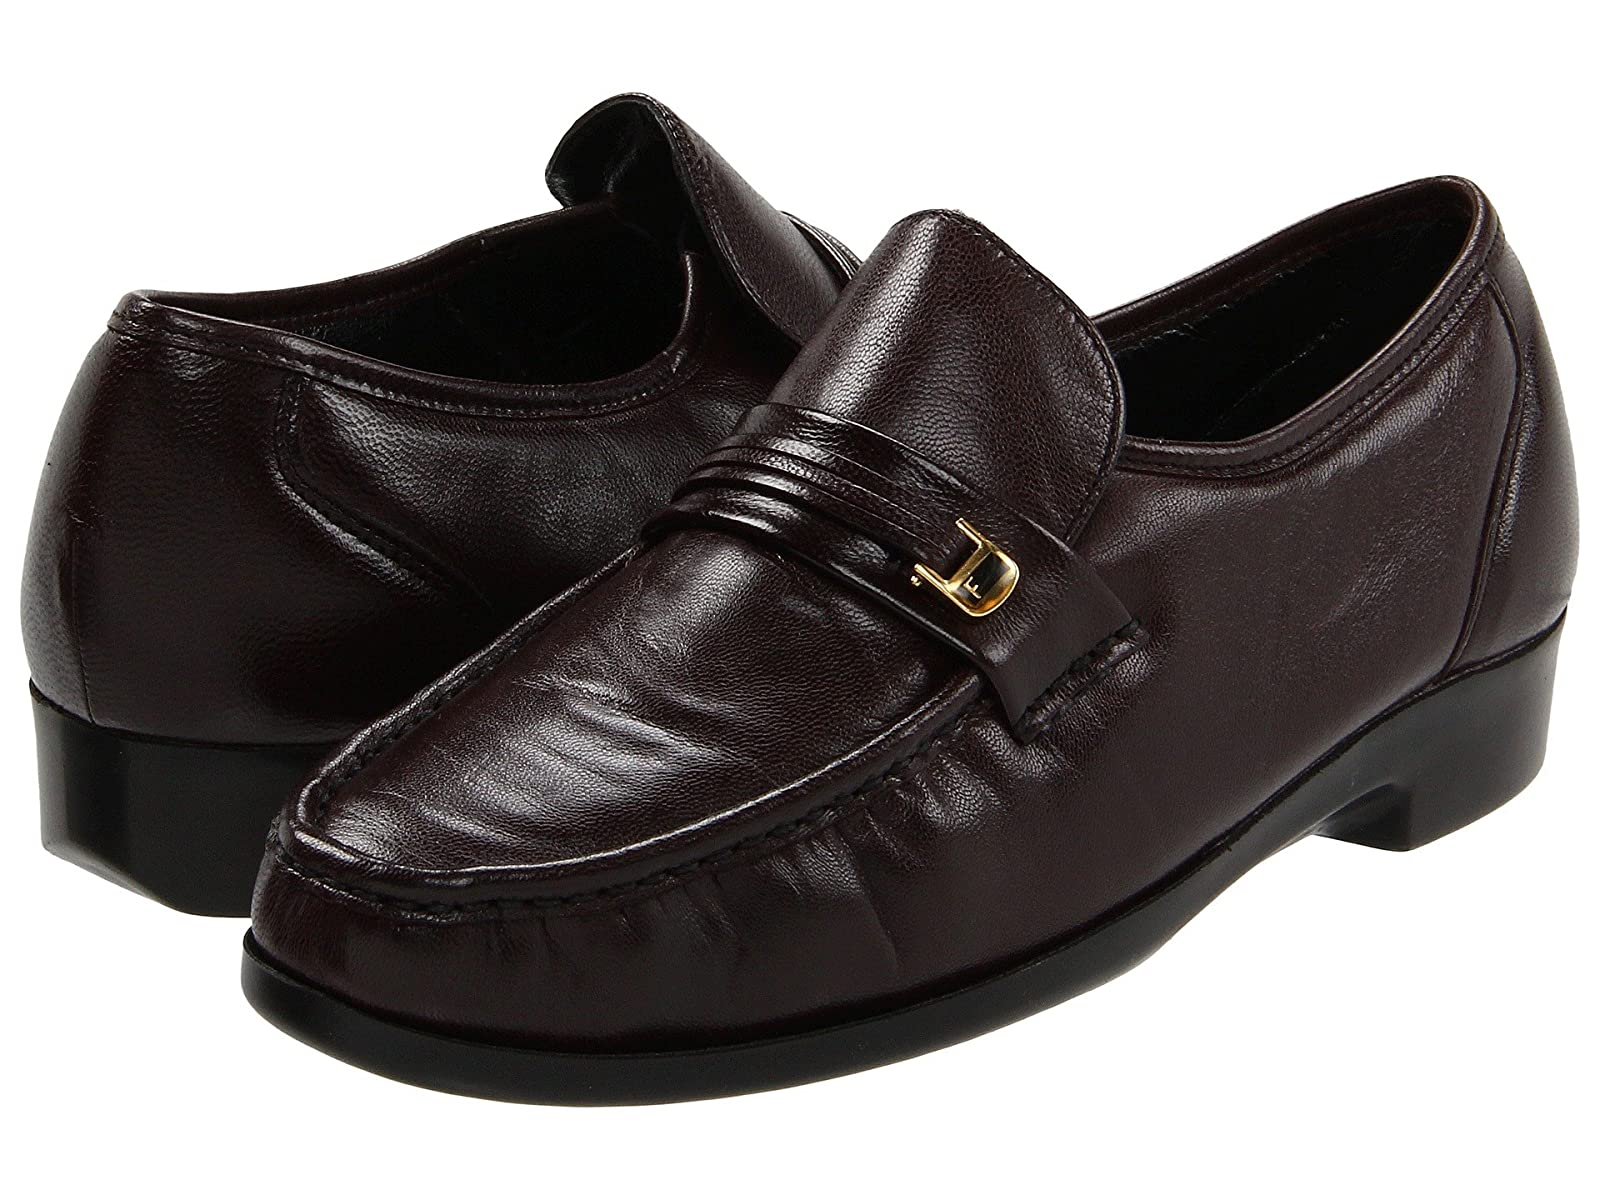 Florsheim RivaAtmospheric grades have affordable shoes